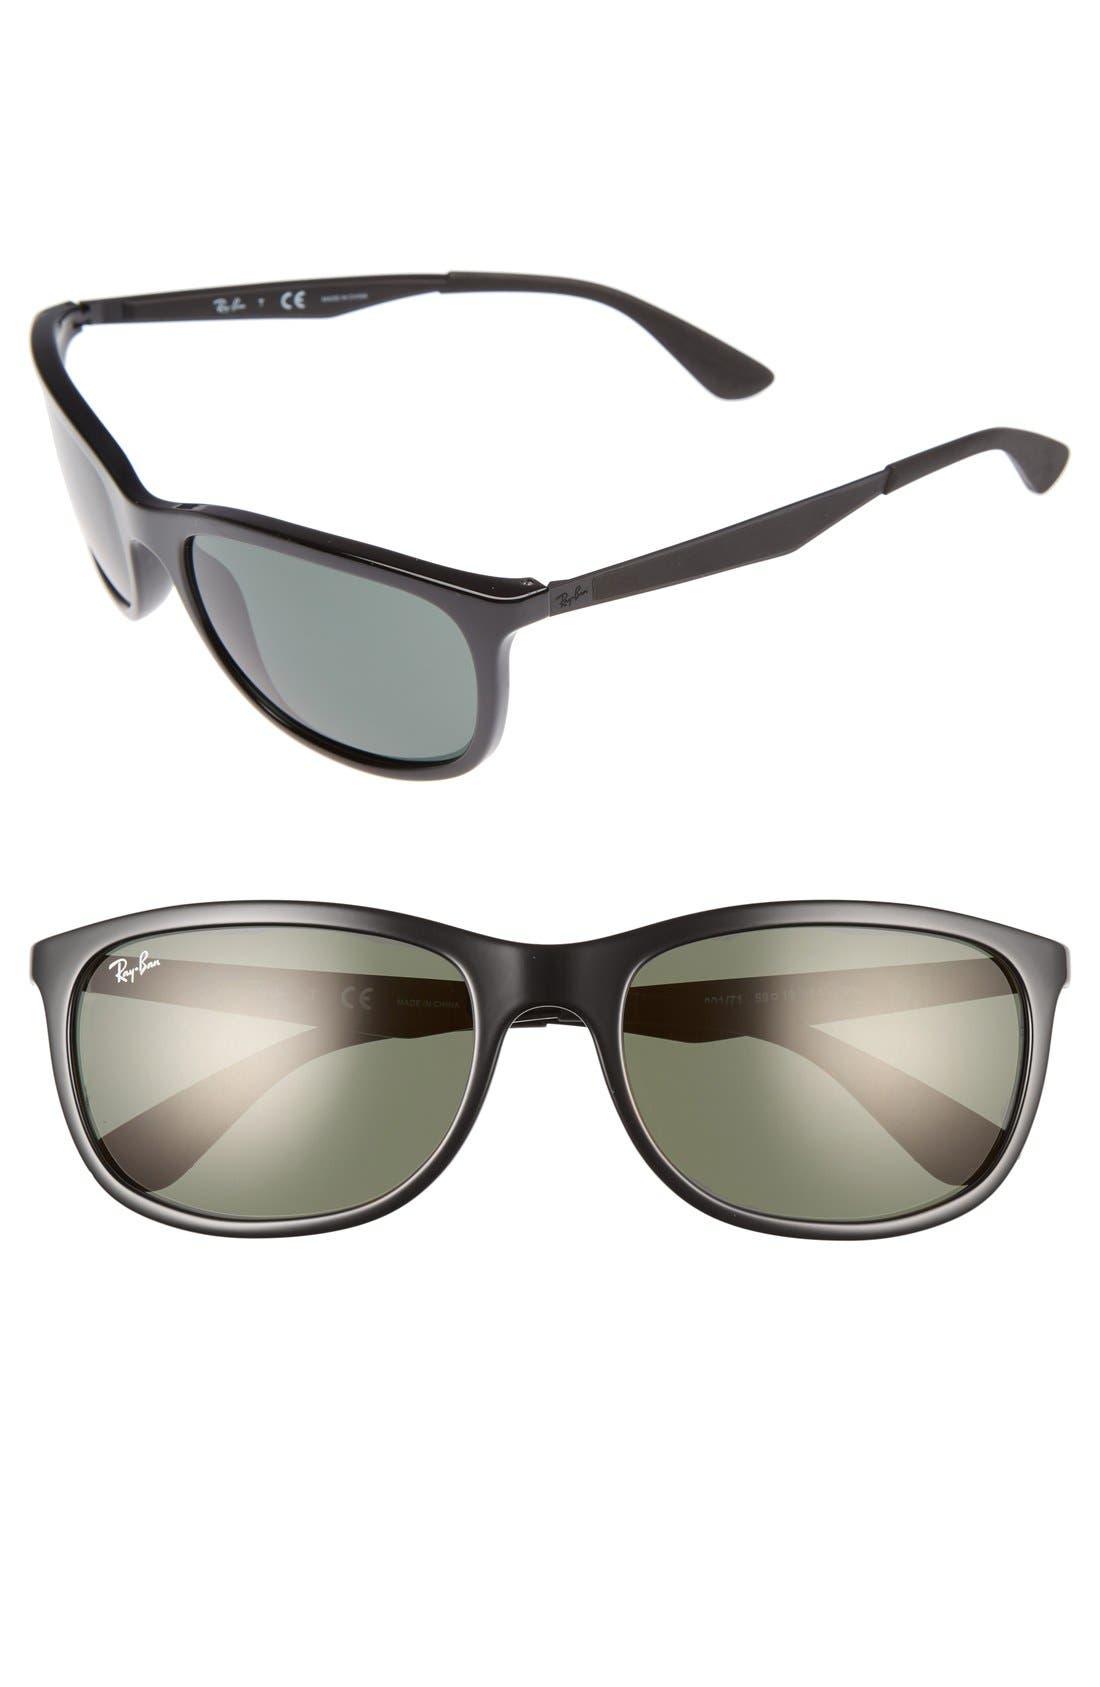 Active Lifestyle 59mm Rectangular Sunglasses,                         Main,                         color, Black/ Green